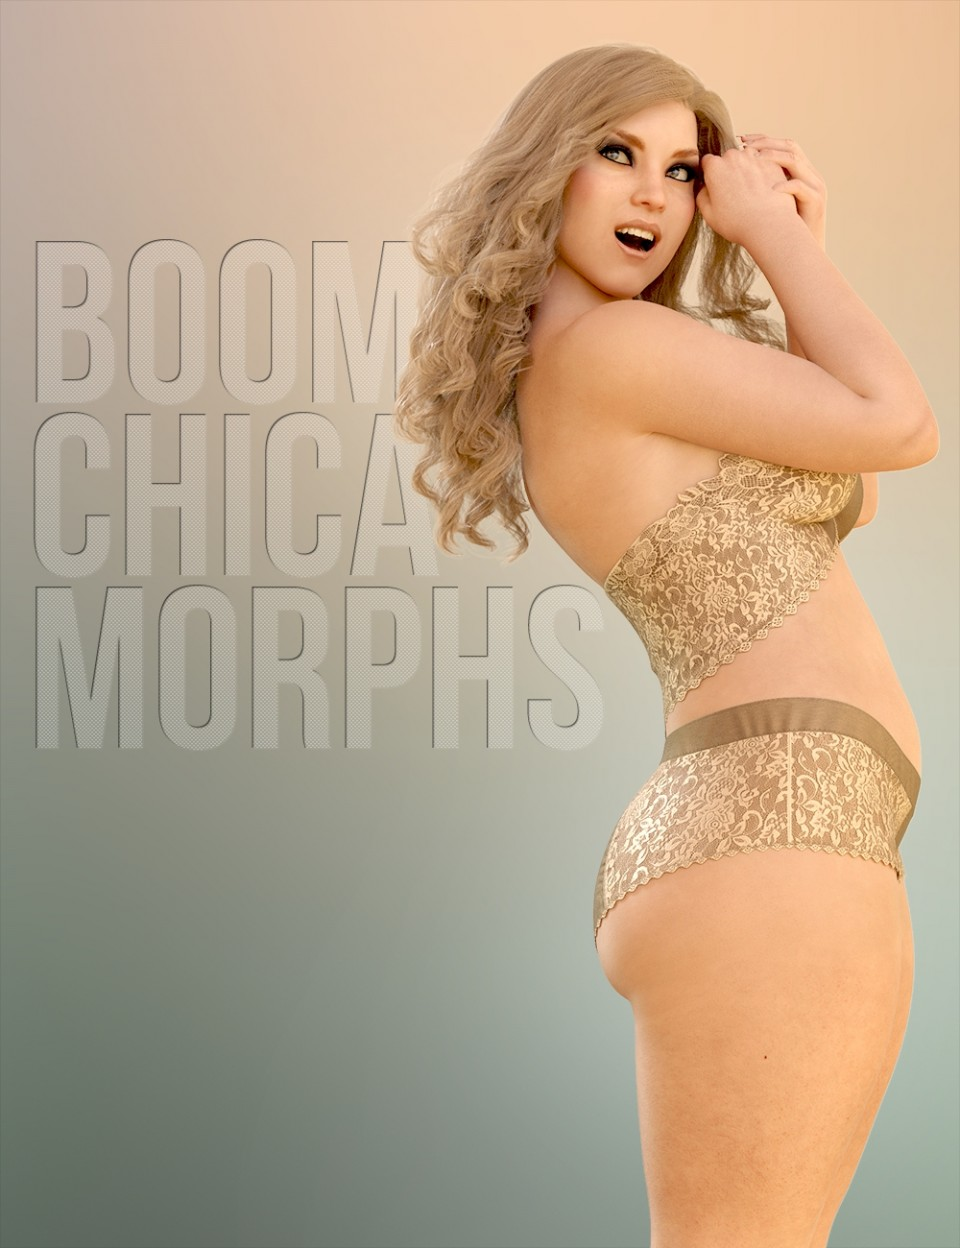 Boom Chica Morphs HD for Genesis 8 Female_DAZ3D下载站